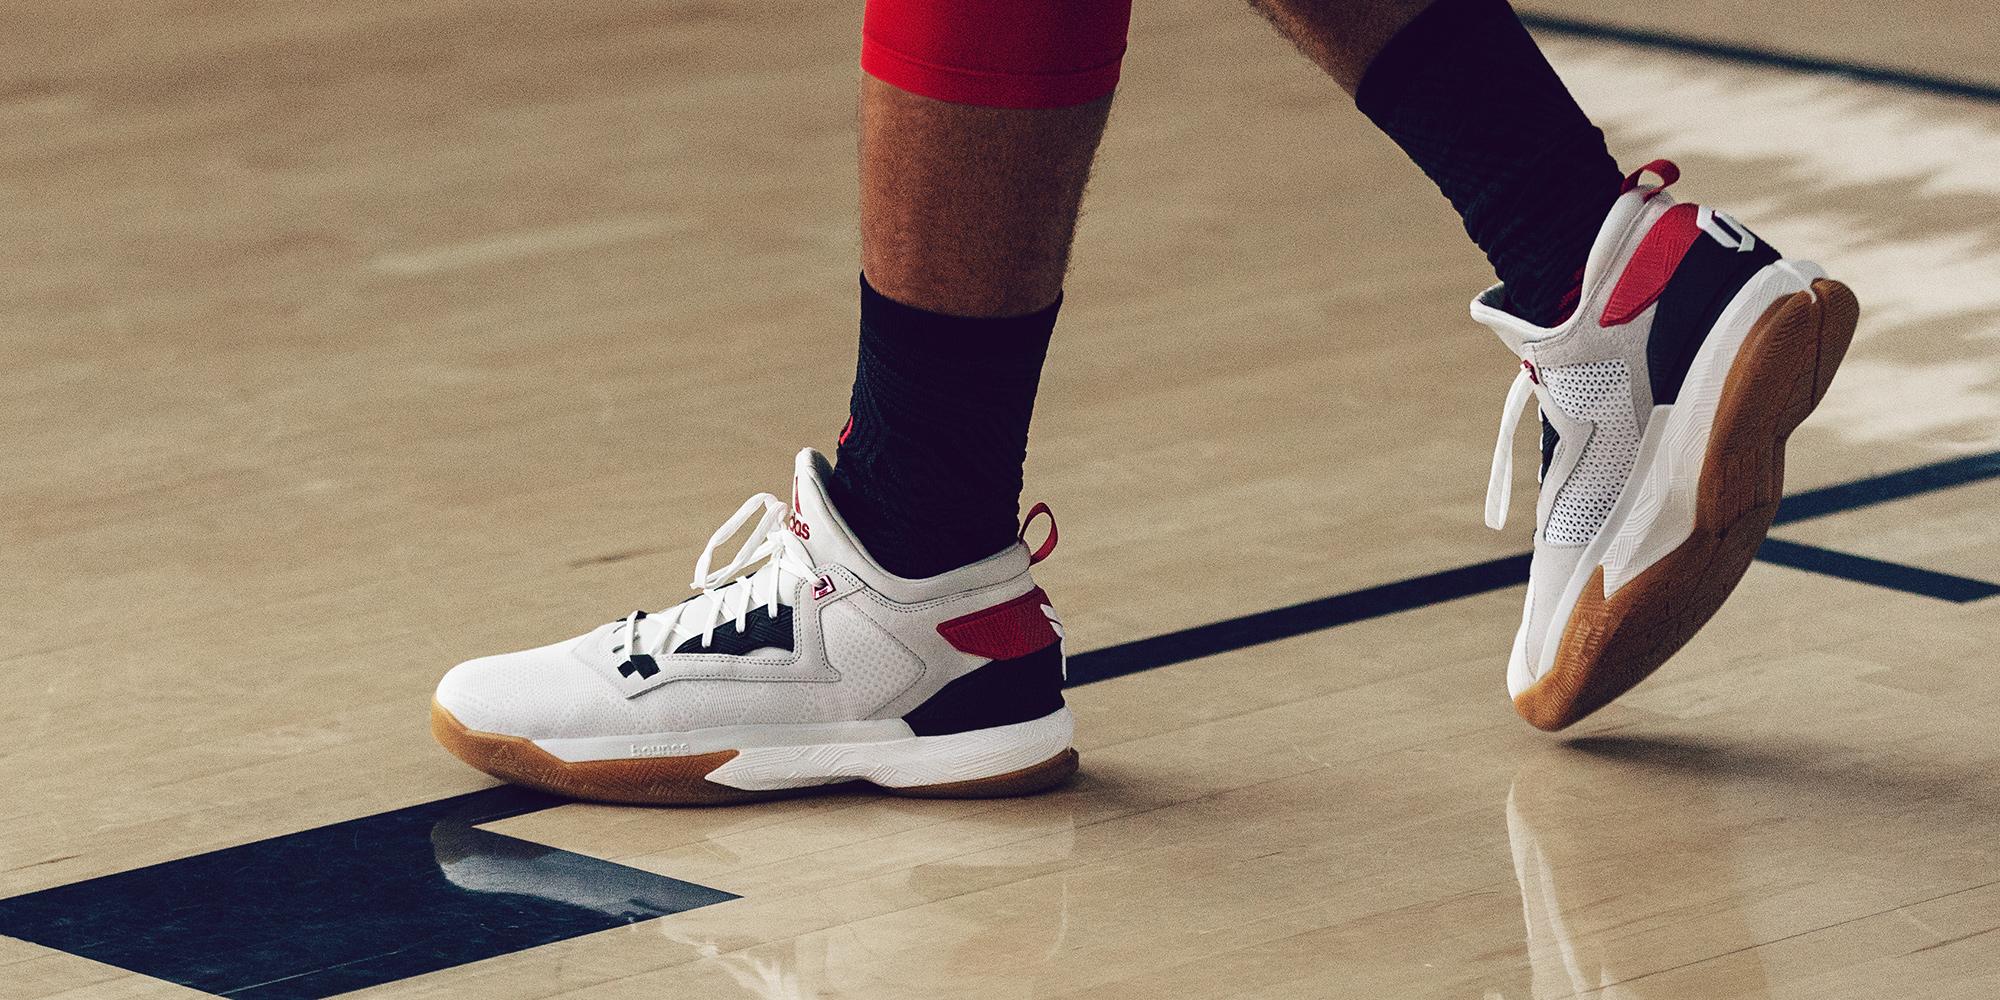 adidas Officially Unveils the adidas D Lillard 2 11